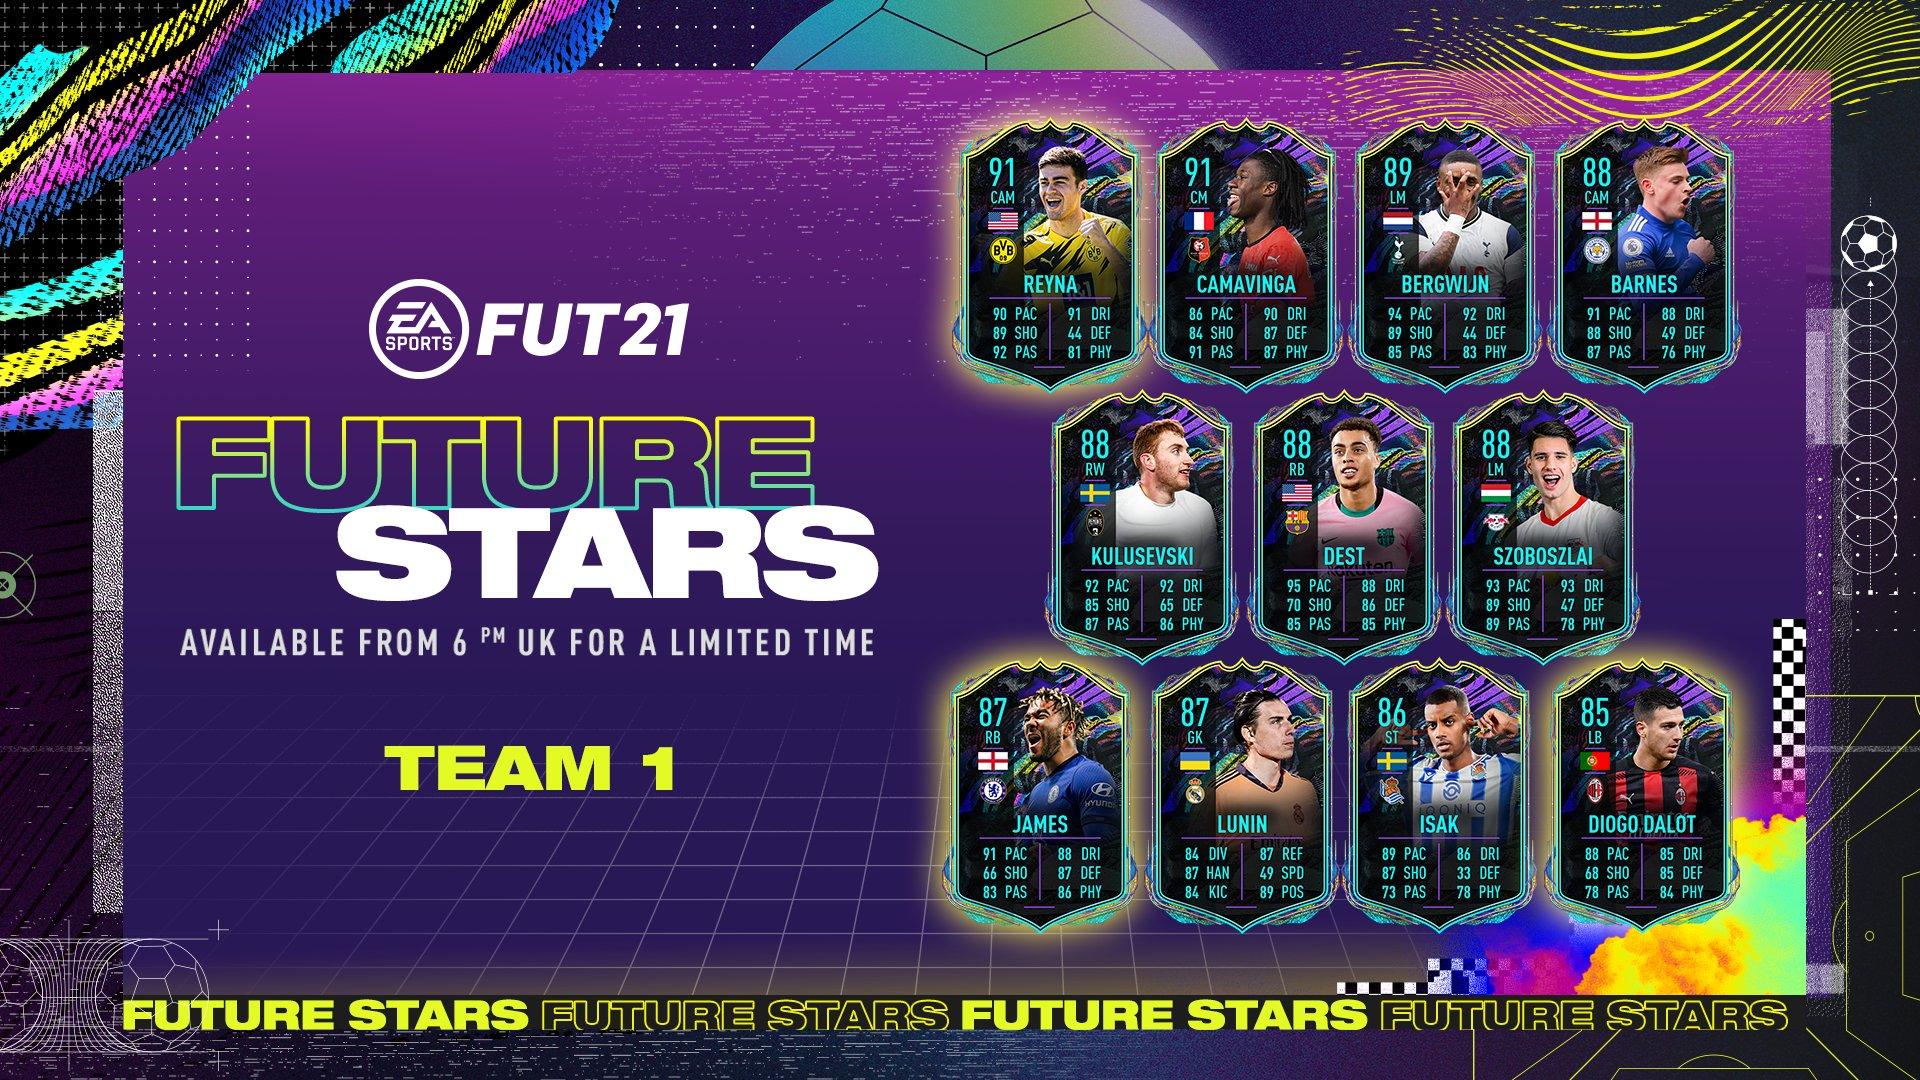 FIFA 21 Ultimate Team: Future Stars